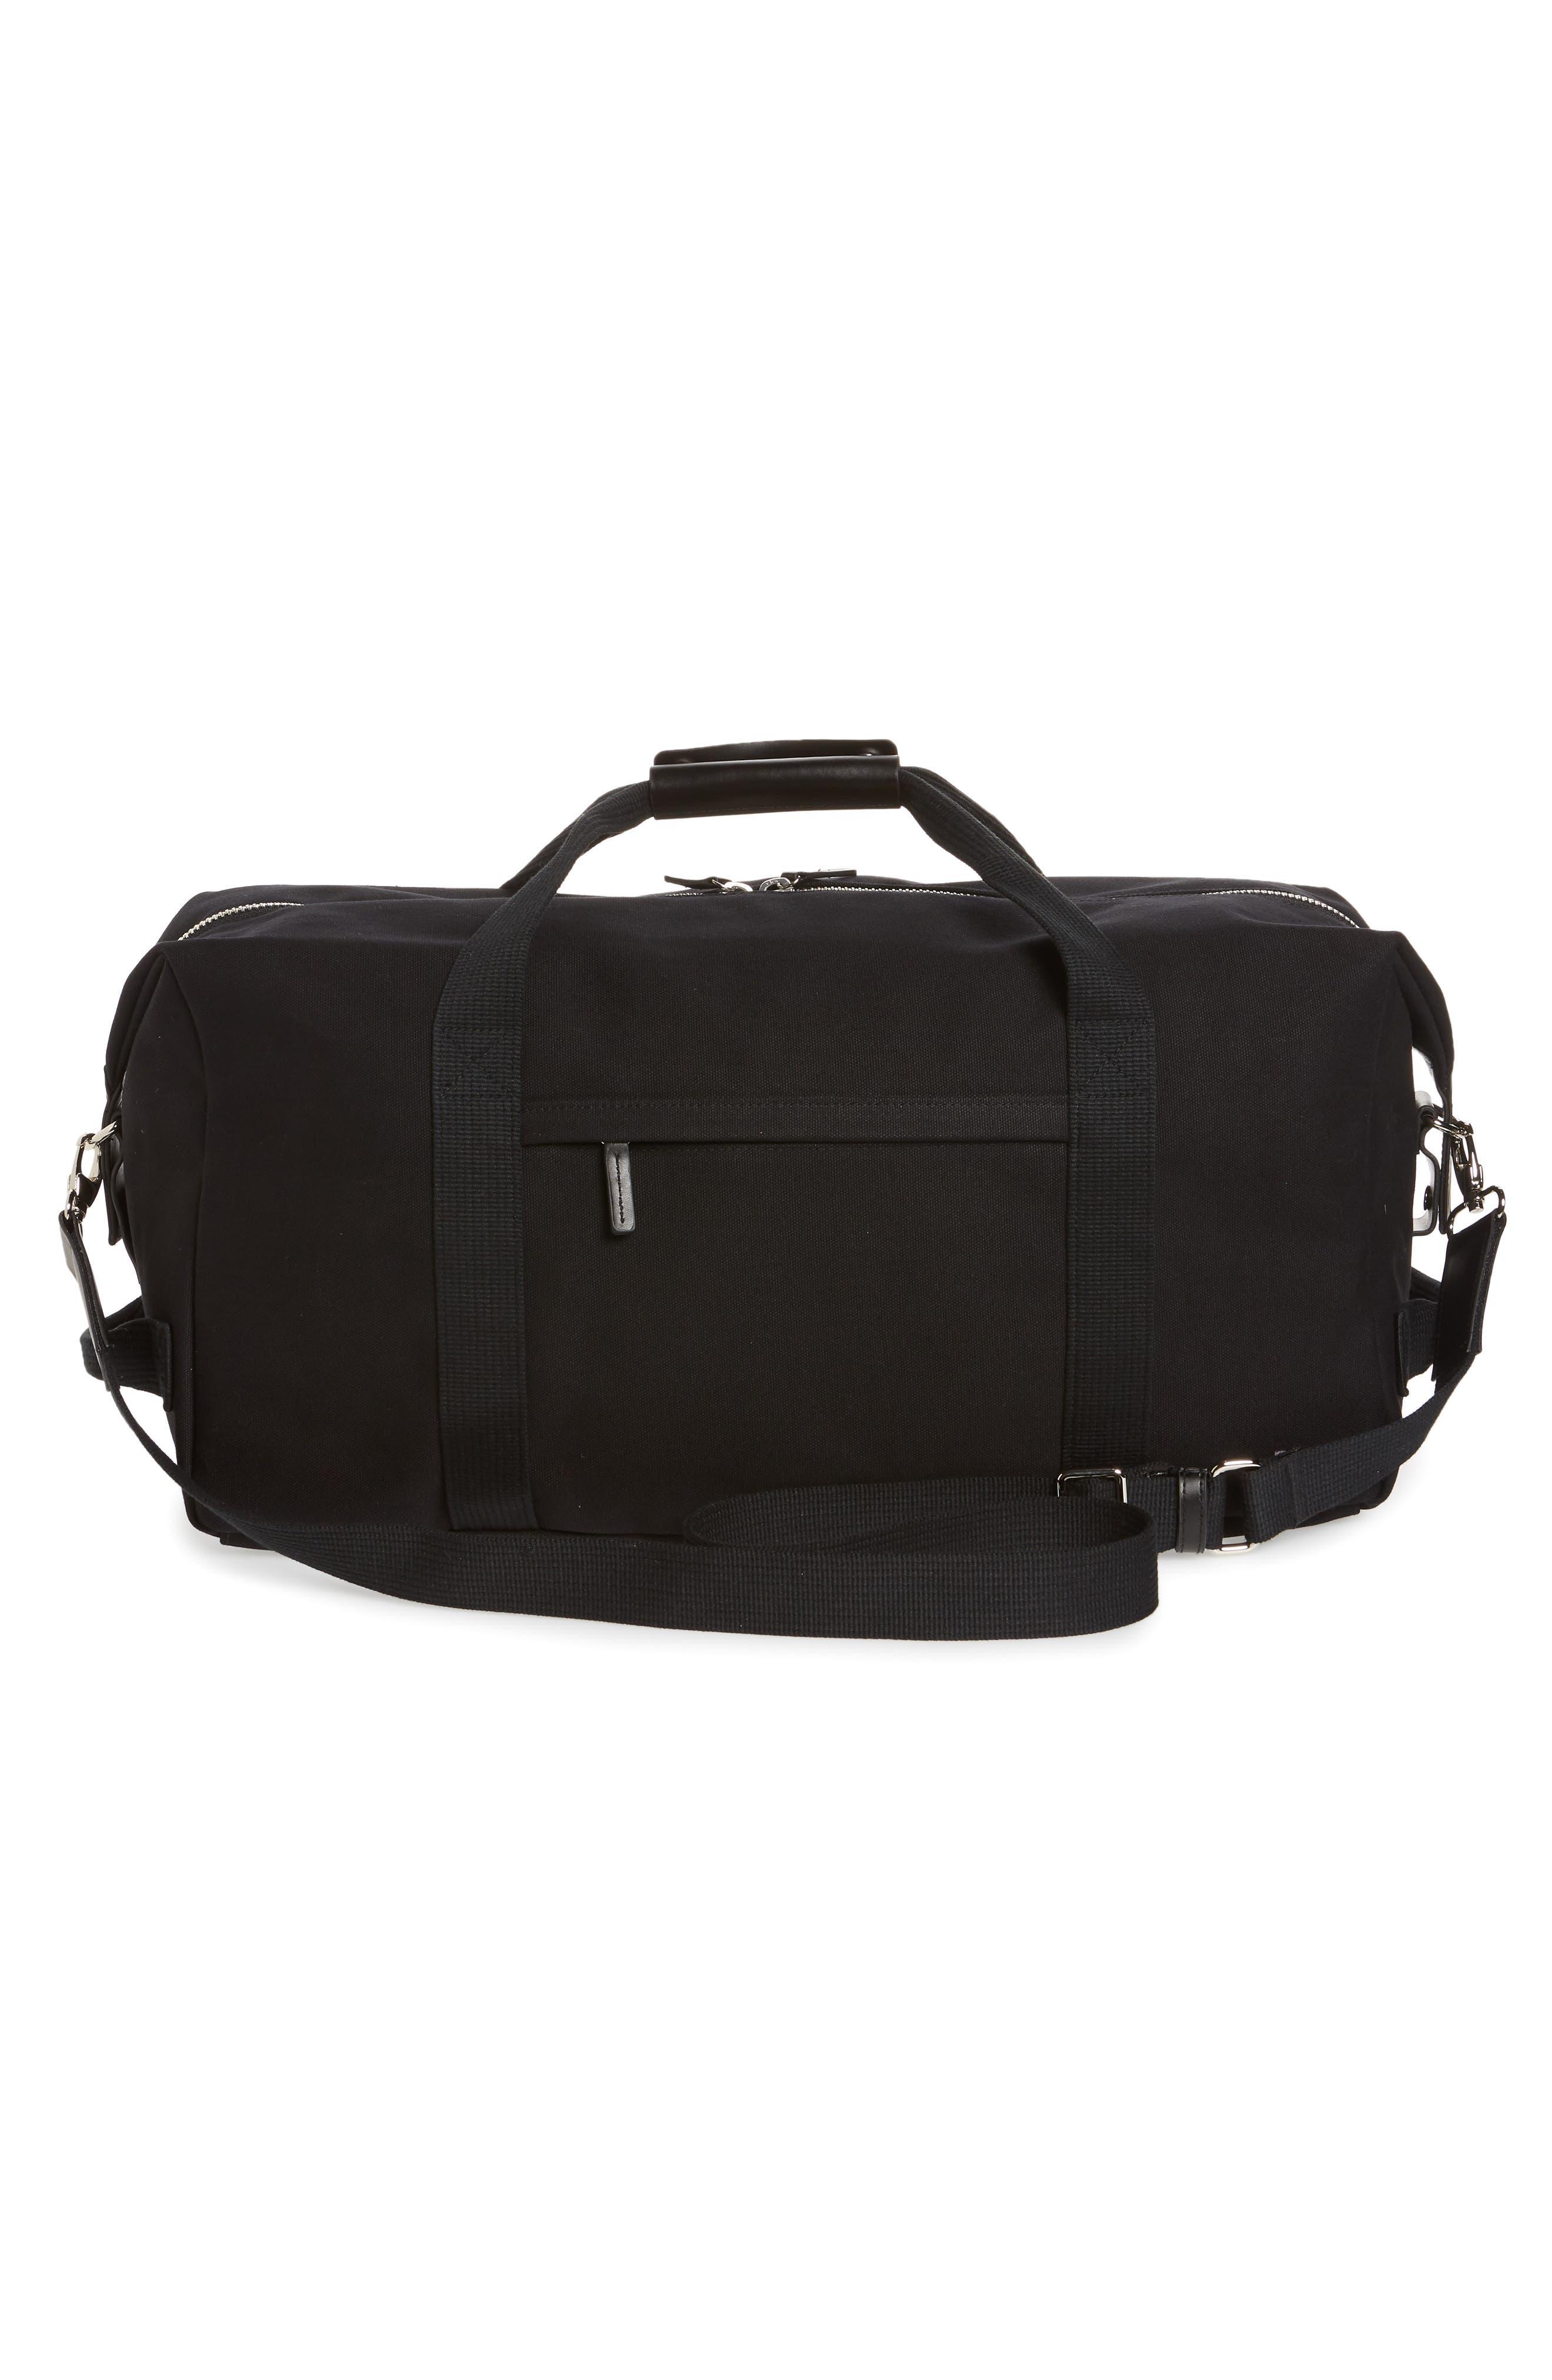 Norfolk Water Repellent Duffel Bag,                             Alternate thumbnail 3, color,                             BLACK